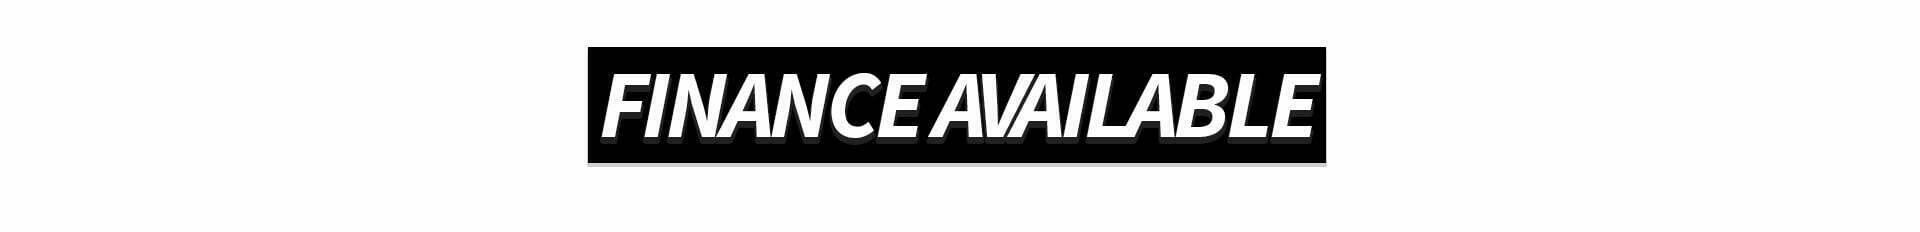 Finance Available LAMCO Barnsley HAM Radio Shop Amateur Radio Dealer Supplier Vine Antennas Amateur Radio Shops HAM Radio Dealer Supplier Retailer Second Hand Twelve Months Warranty, Amateur Radio Sales. HAM Radio Sales. HAM Radio Shop, HAM Radio Shops, Amateur Radio Dealers, HAM radio dealers UK. Icom, Kenwood, Yaesu, Hytera. HAM Radio Shops, Amateur Radio Shop, Icom, Hytera, Kenwood, Yaesu, Antennas, Antenna Tuners, Power Supplies, Coax, CB Radio, Scanners, Receivers, Short Wave, Barnsley, UK, Call 01226 361700, Yorkshire The HAM Radio Shop Amateur Radio Dealer Suppliers United Kingdom Two Way Radio Hire Two Way Radio Sales Repair Service Scanners CB Radio Receivers Short Wave Radio